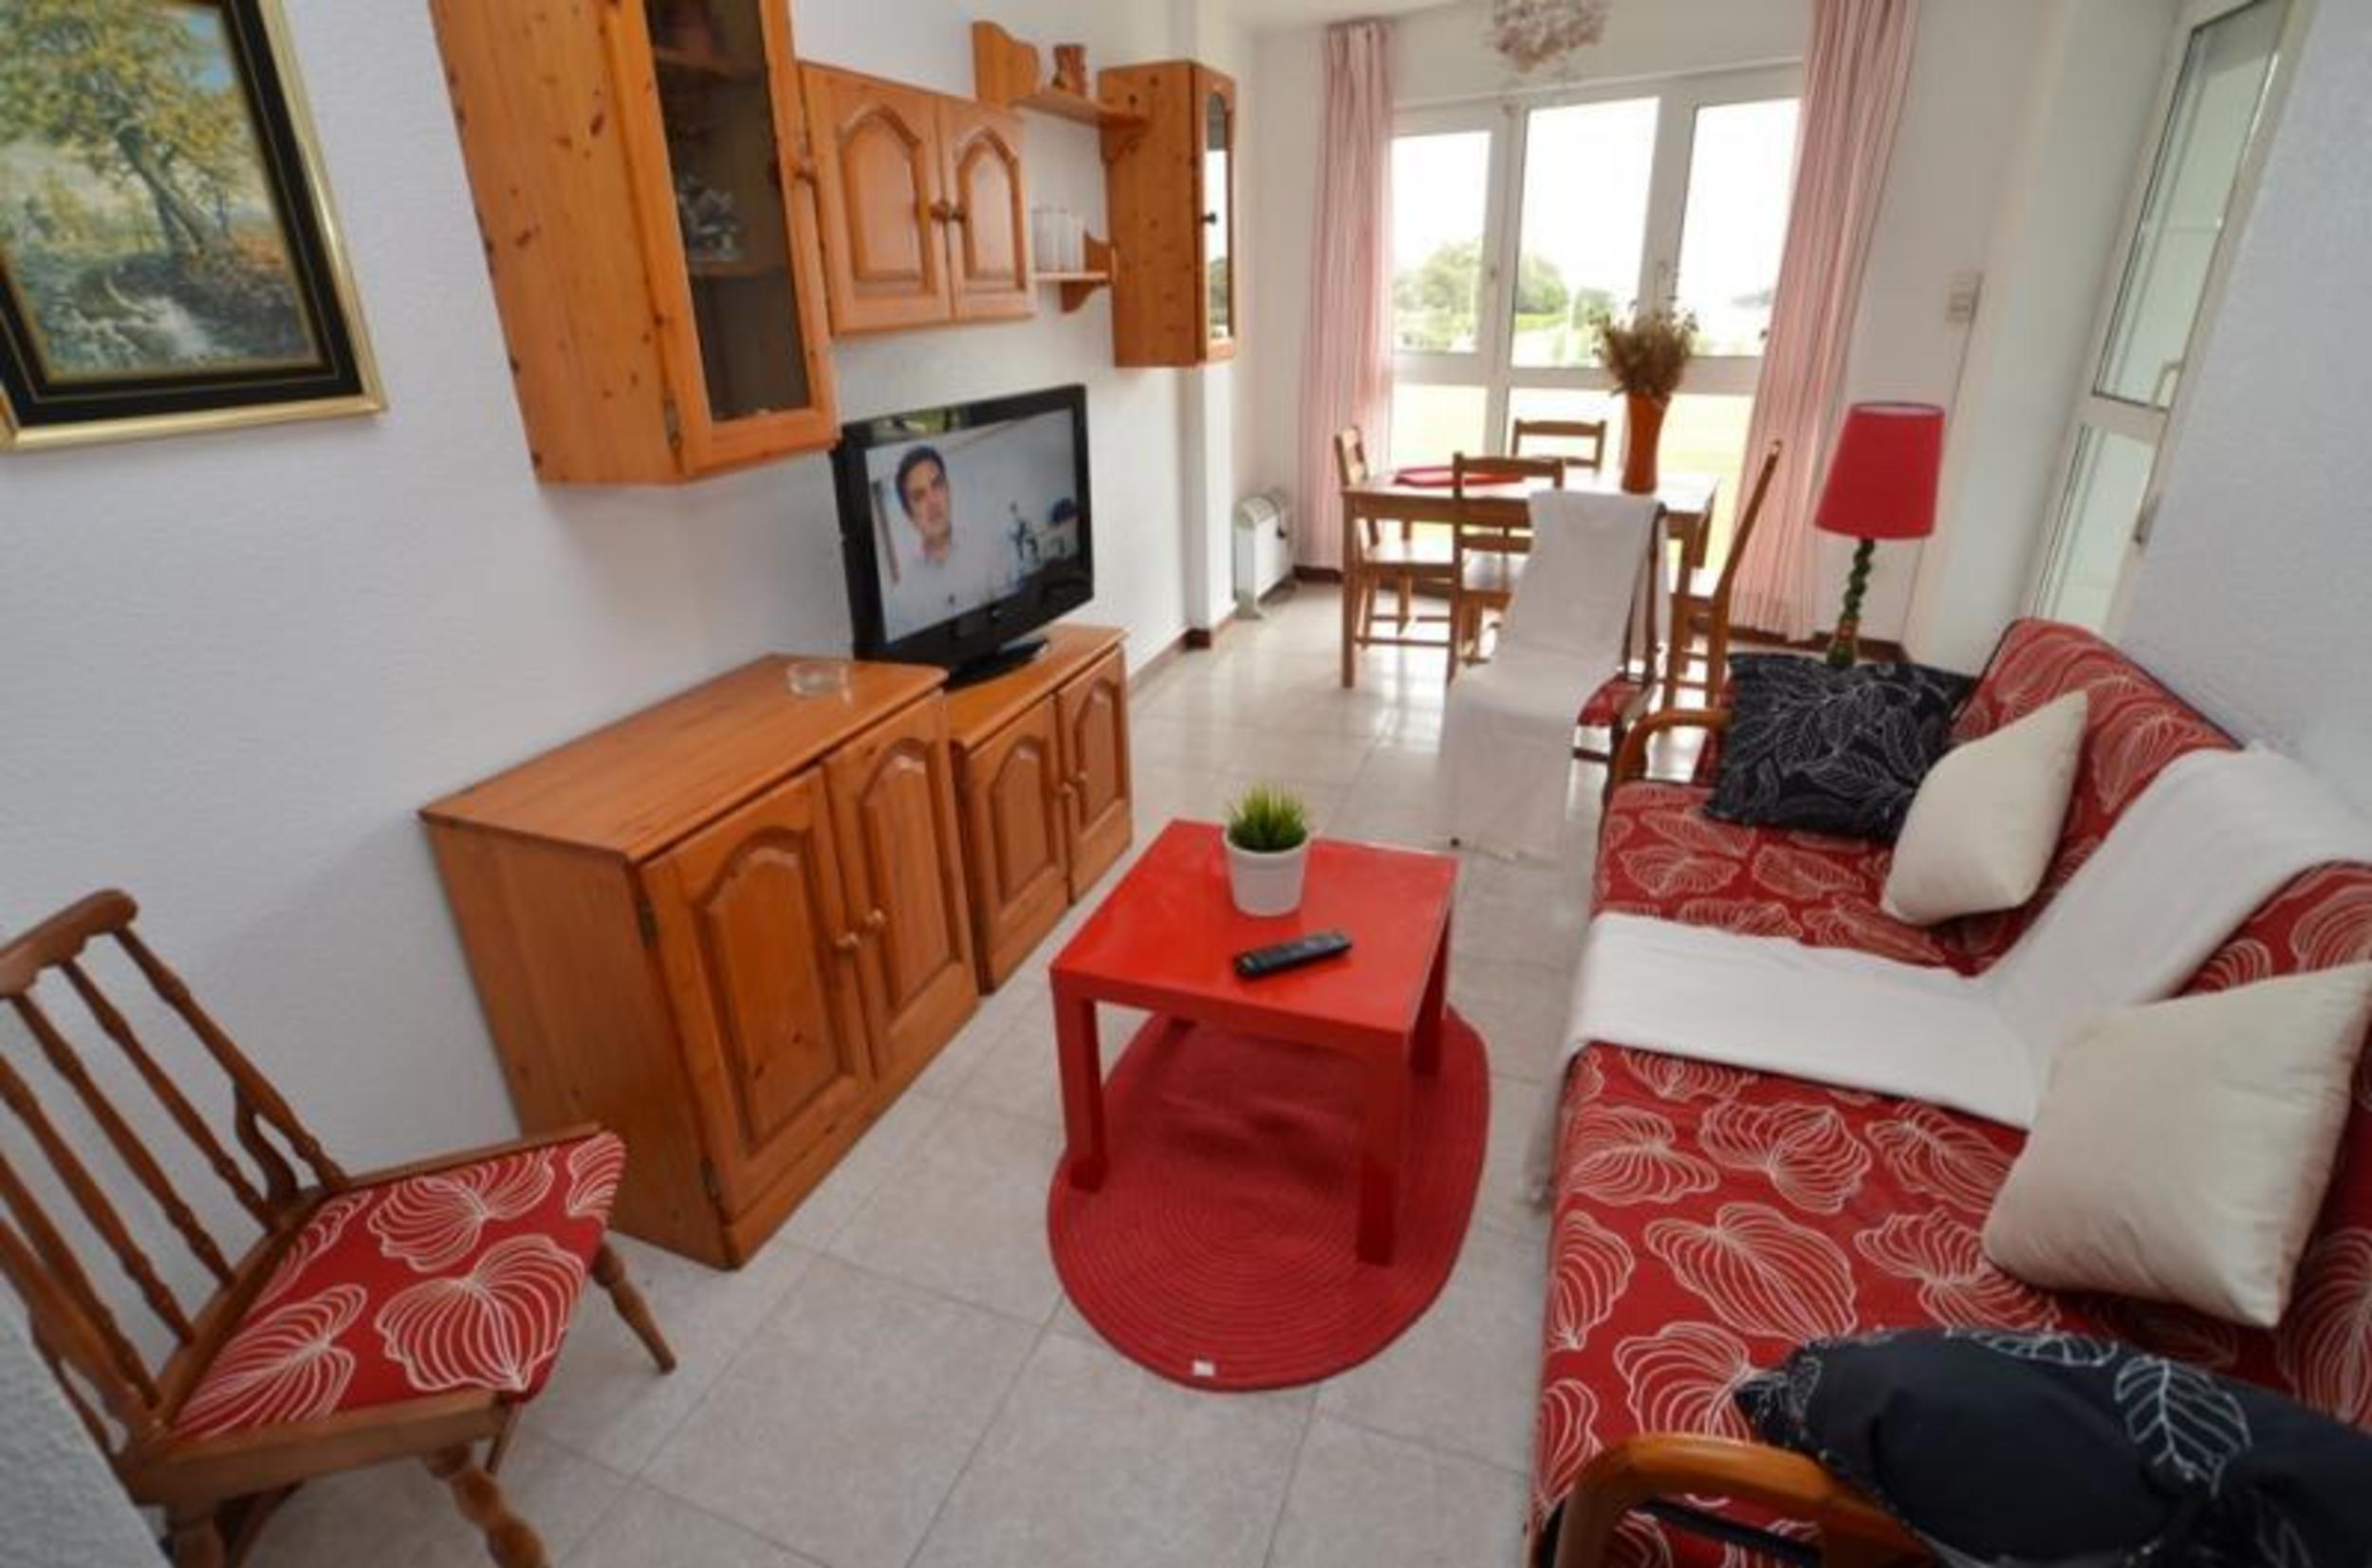 Ferienwohnung Apartment - 2 Bedrooms with Pool and Sea views - 102761 (2360861), Isla, Costa de Cantabria, Kantabrien, Spanien, Bild 3